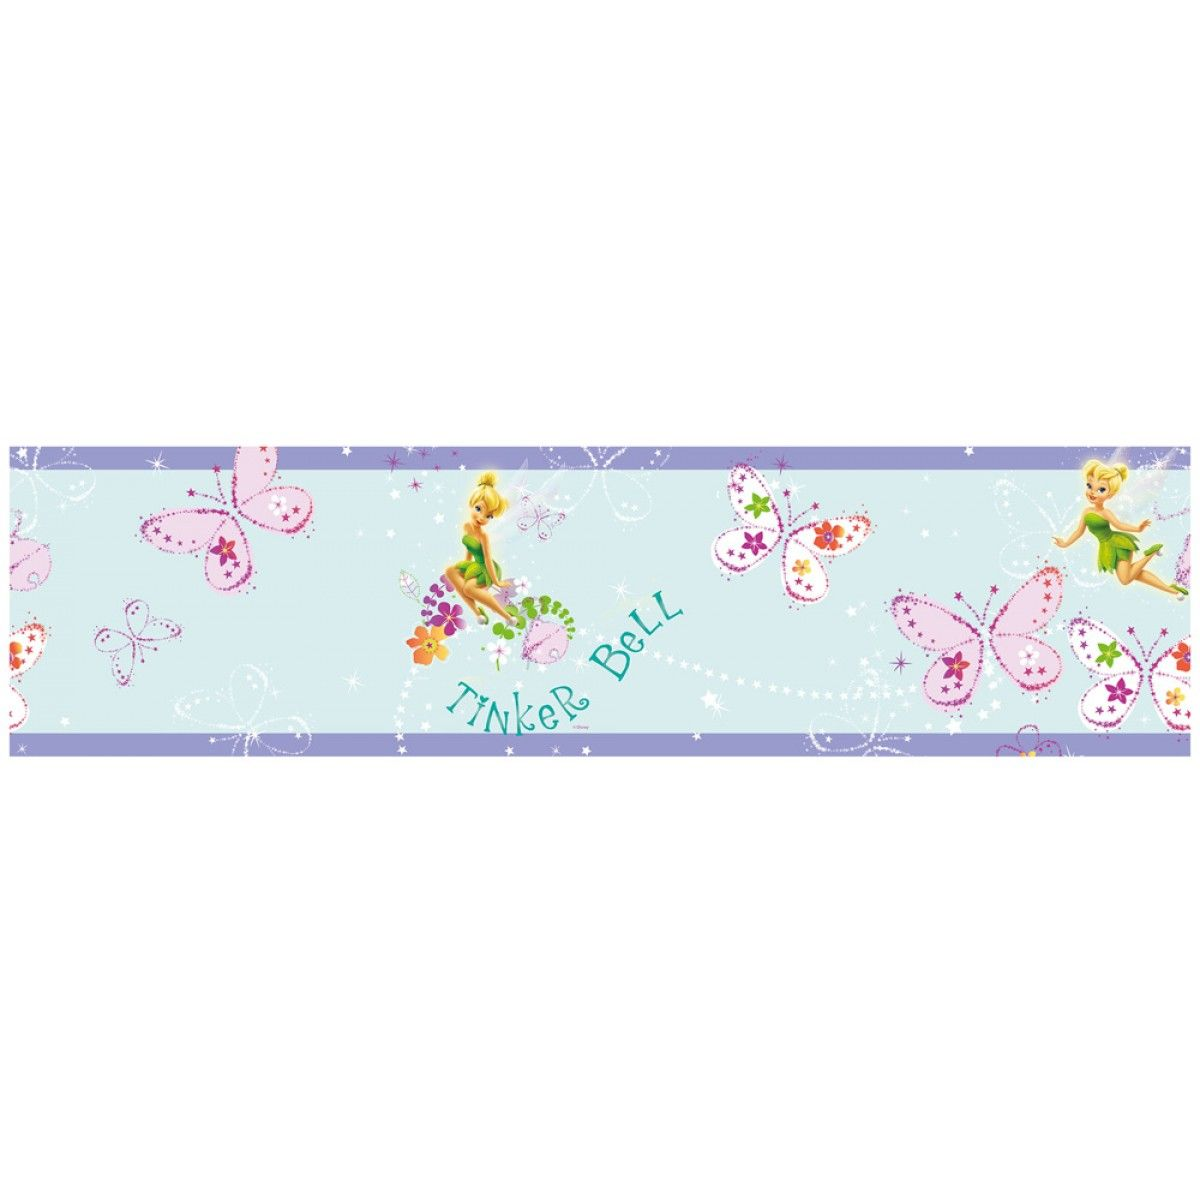 Disney Fairies Just Add Pixie Dust Self Adhesive Wallpaper ...